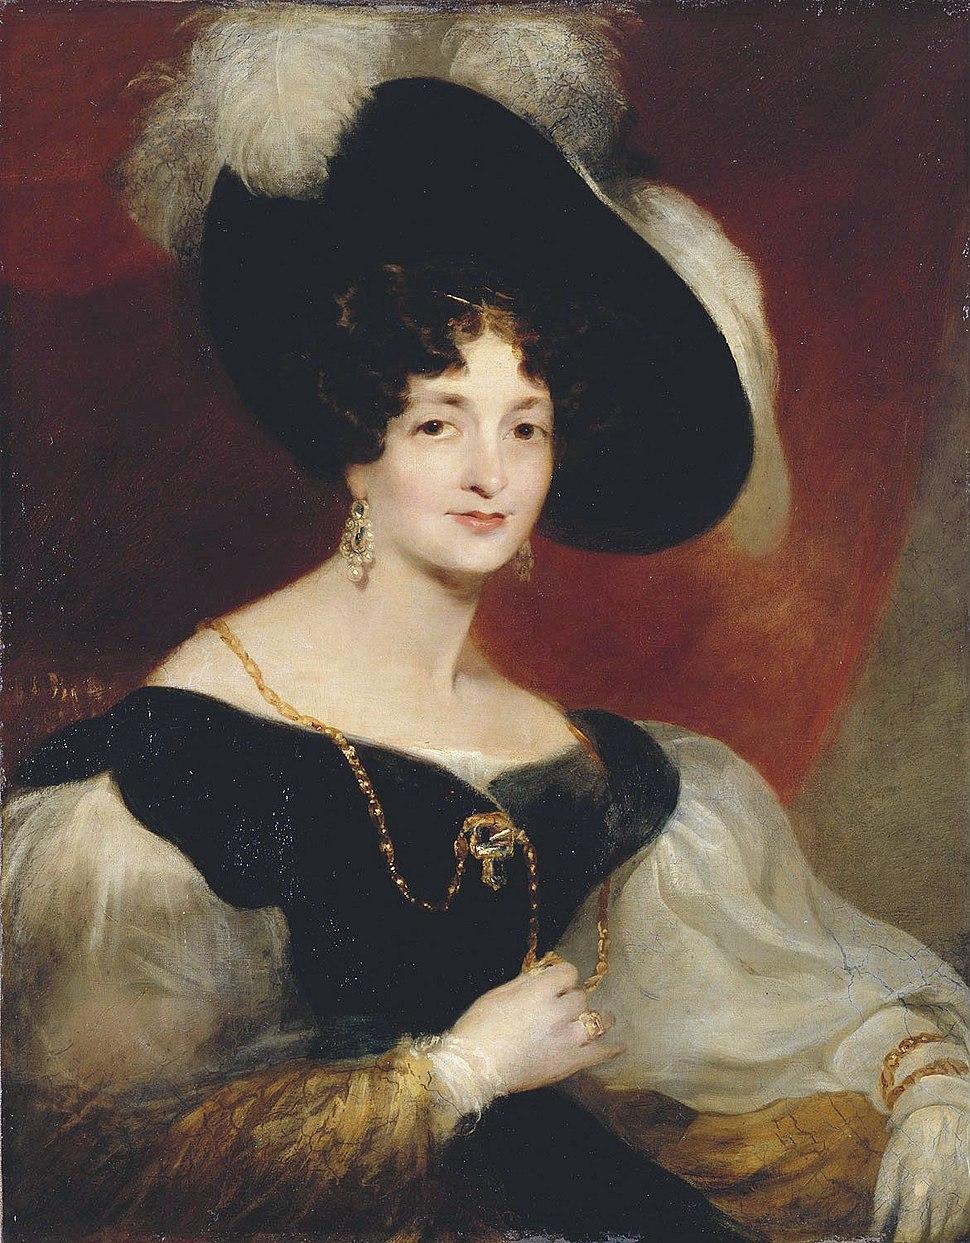 Victoria of Saxe-Coburg-Saalfeld - Rothwell 1832